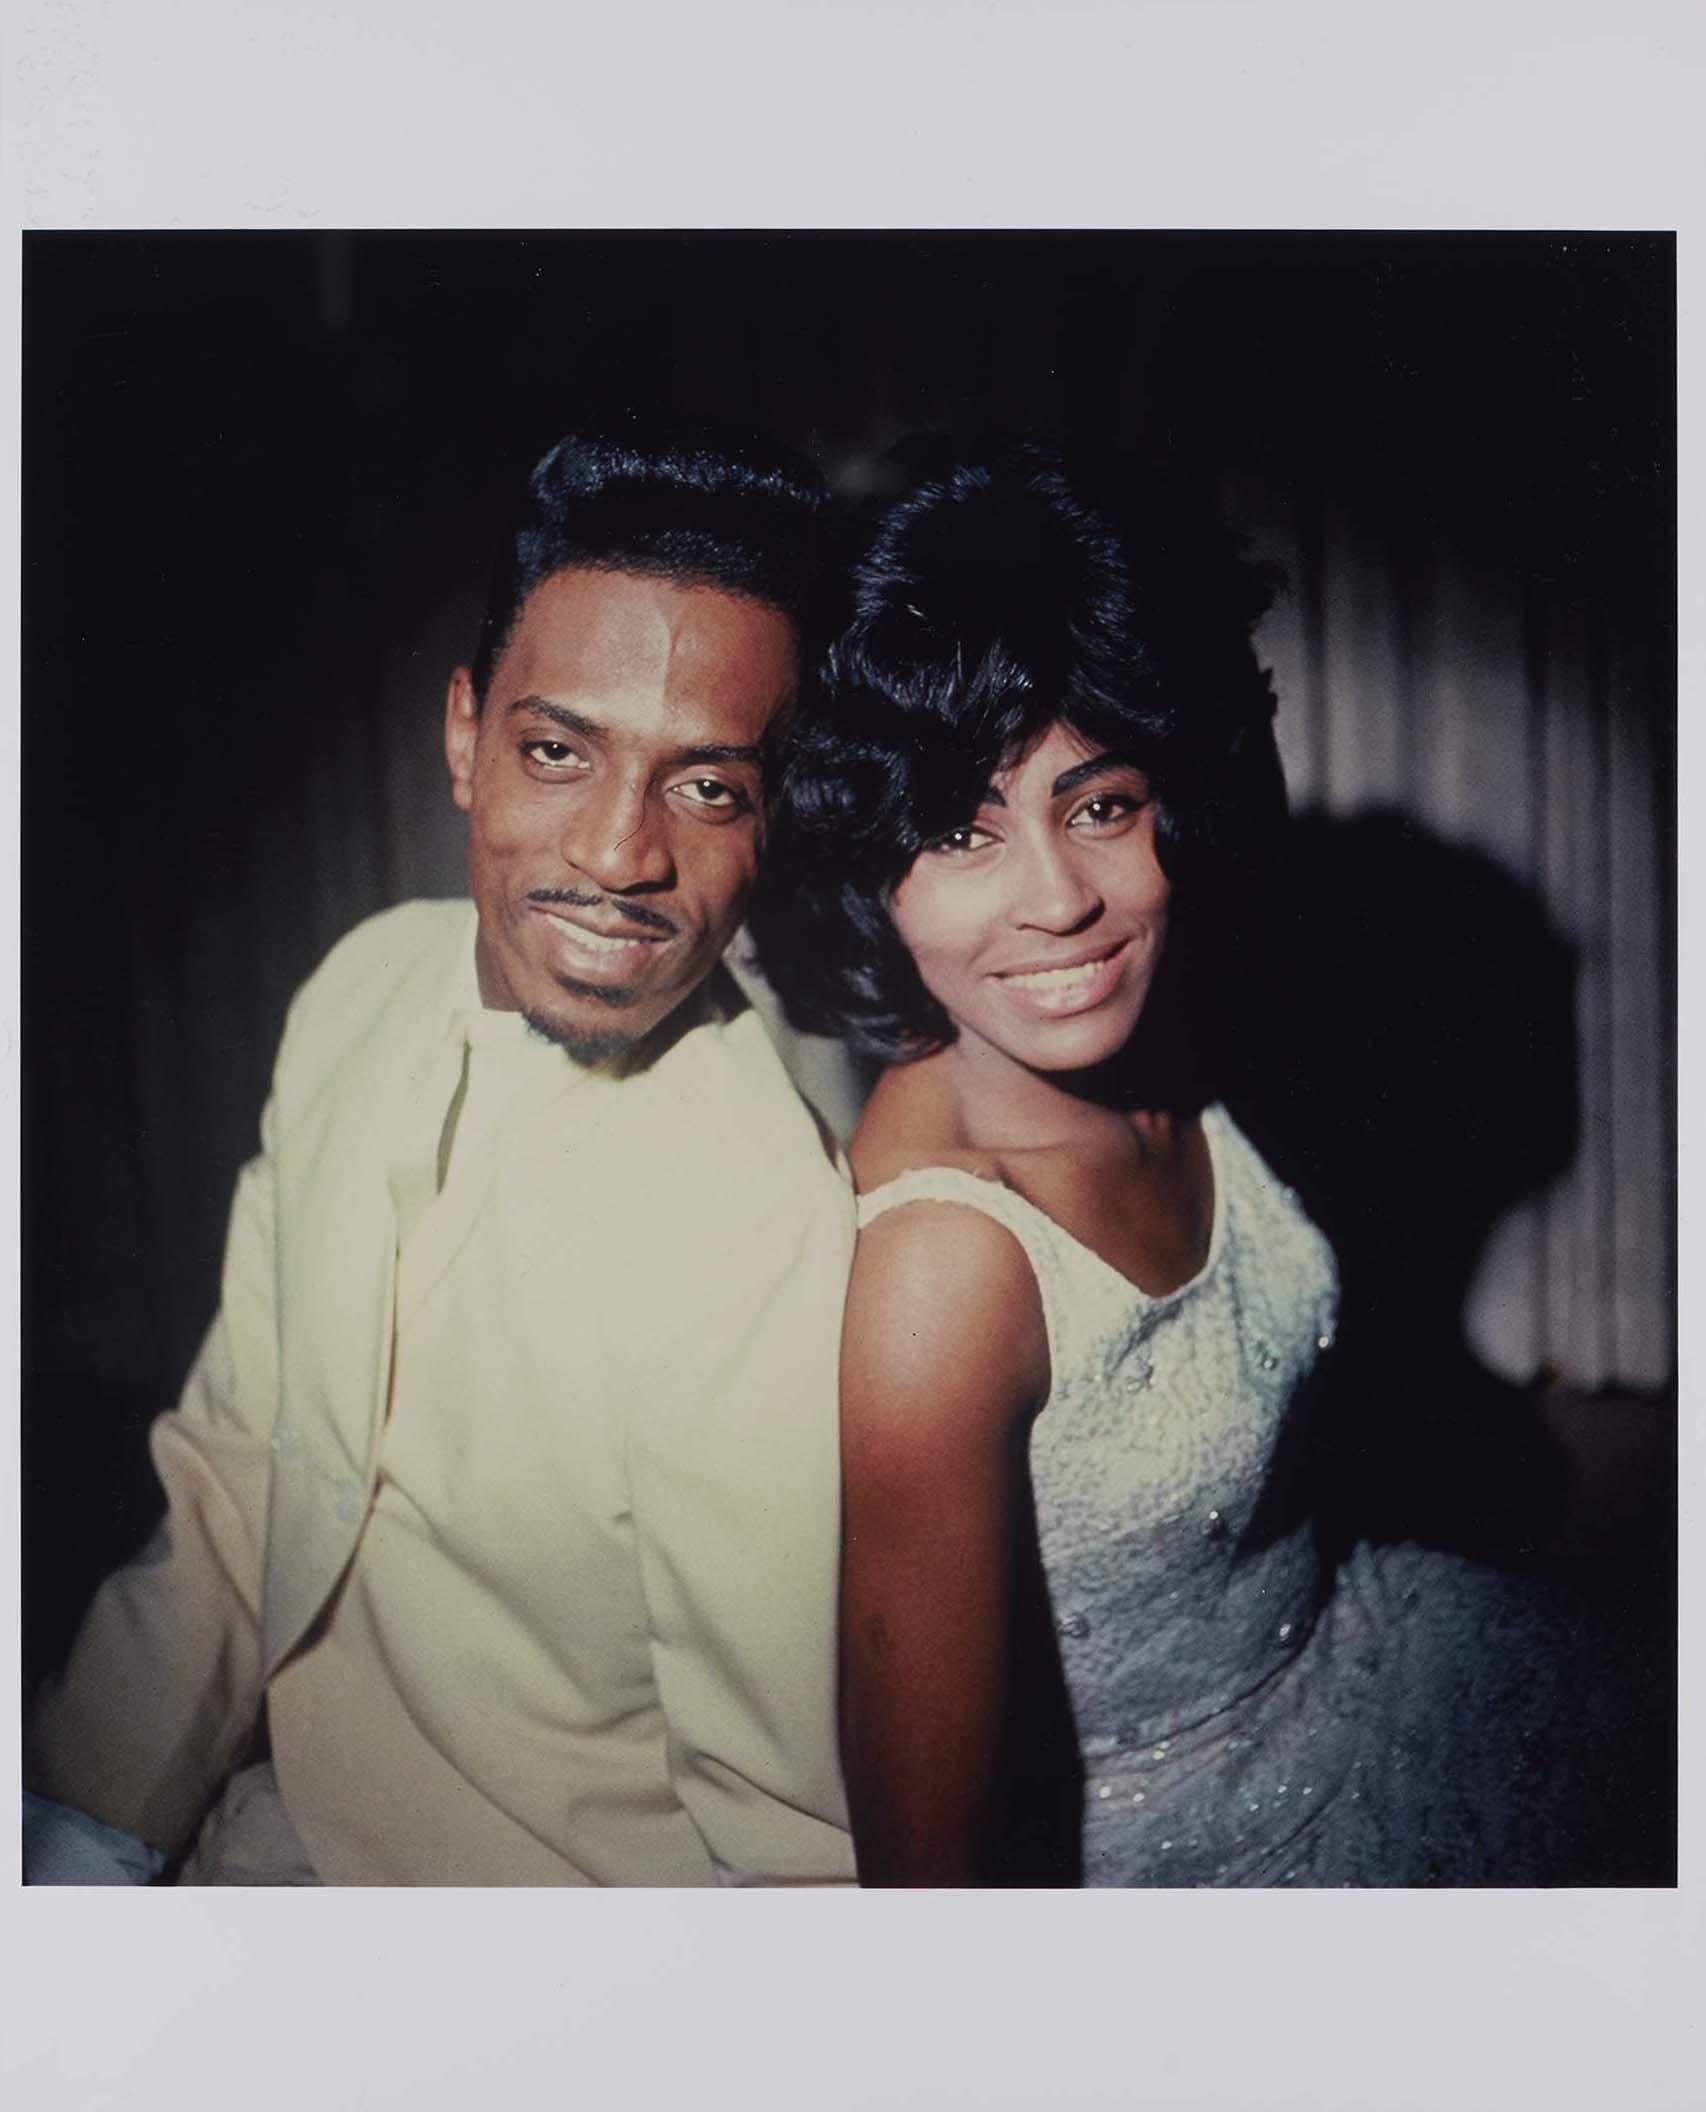 Ike and Tina Turner photo